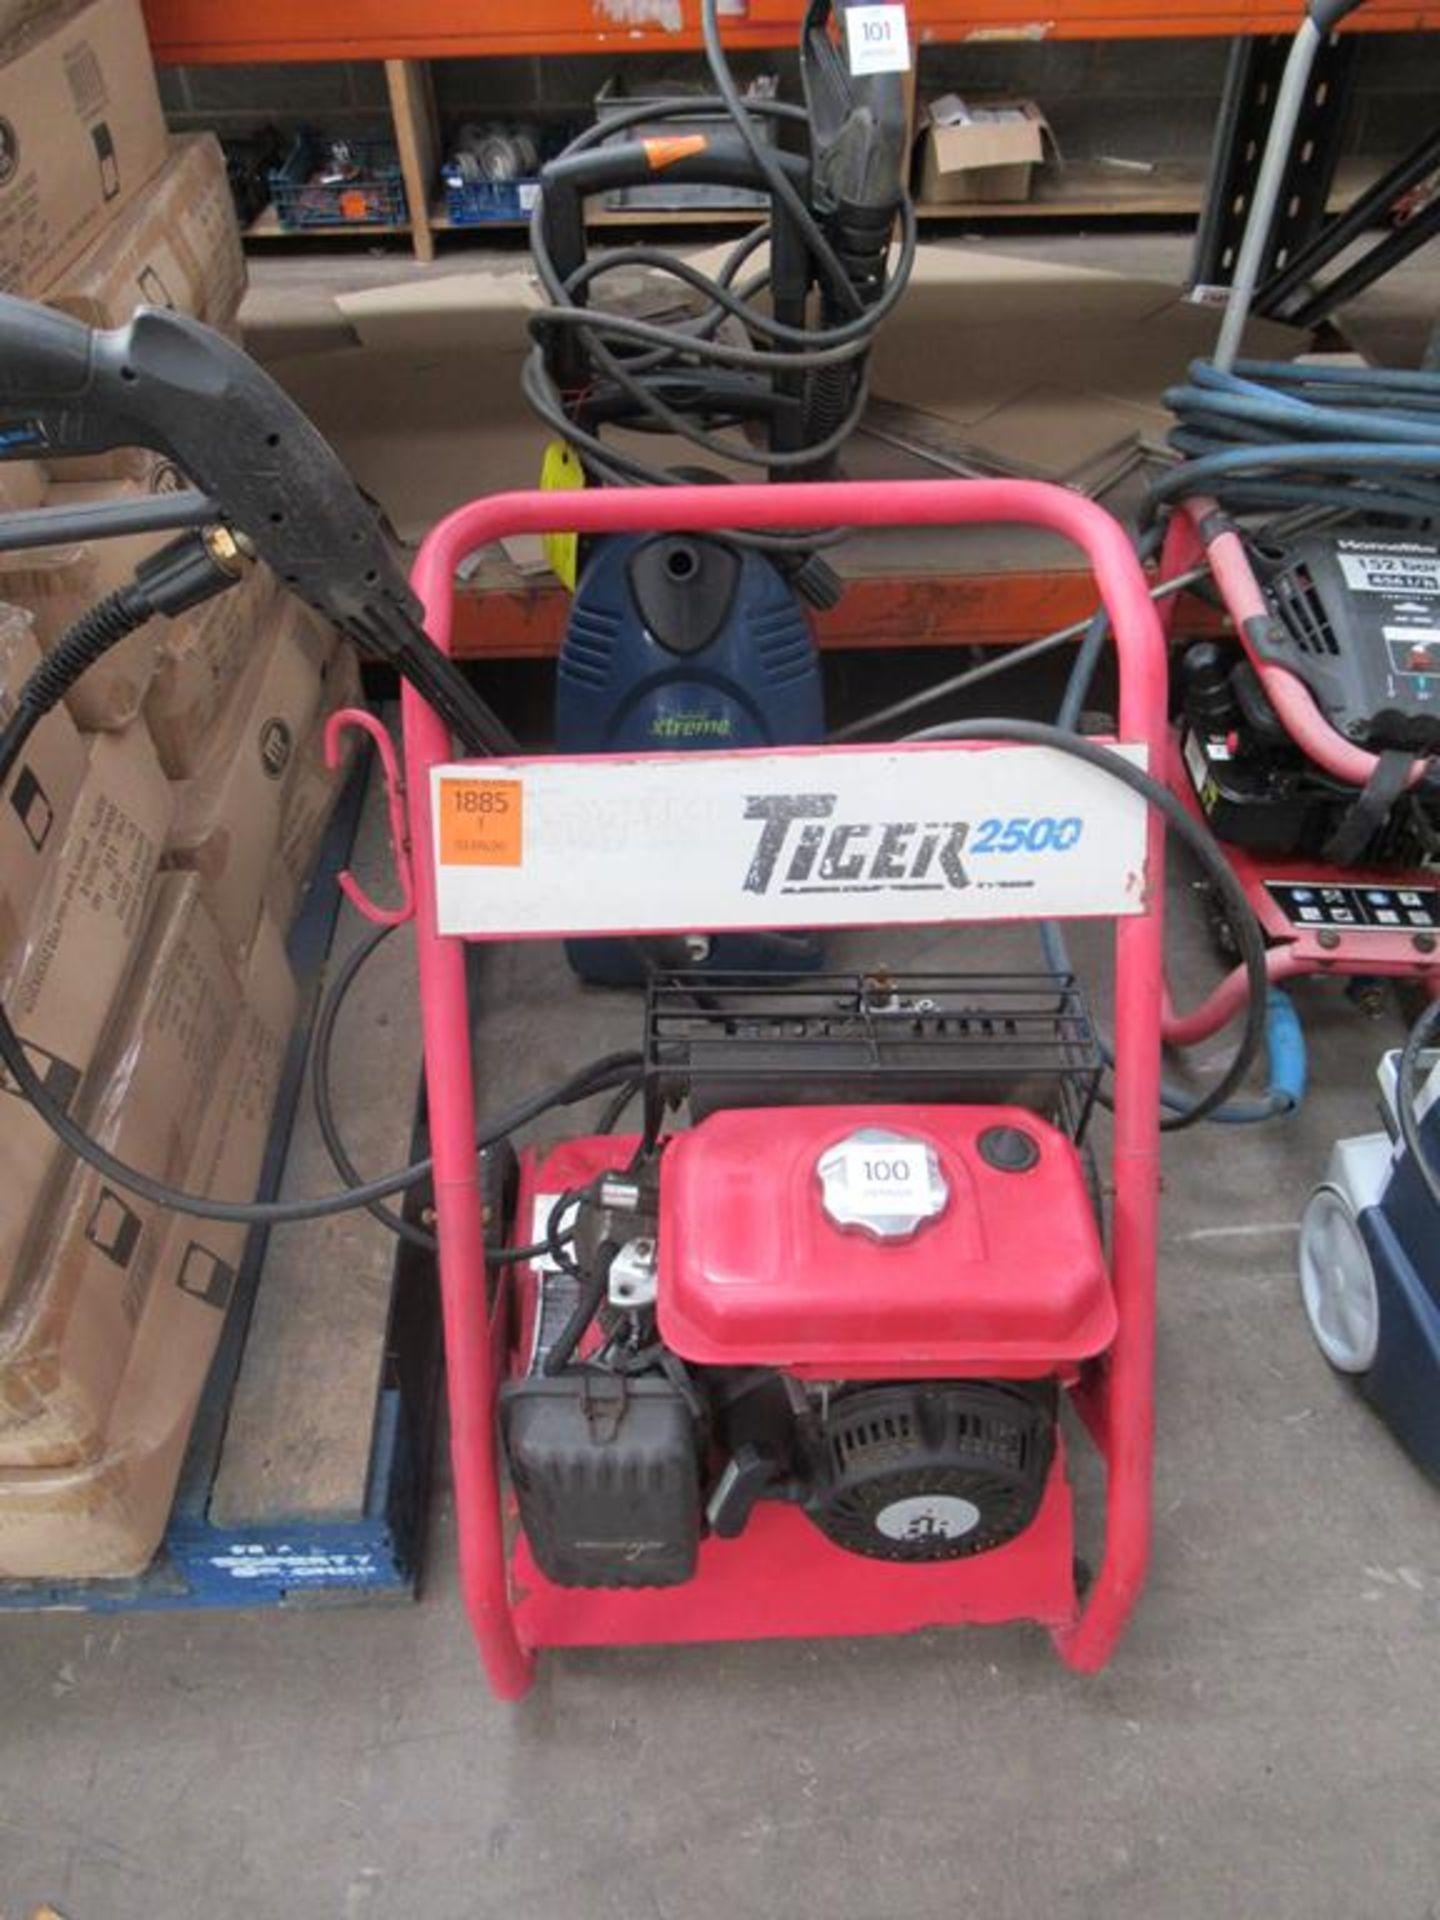 Clarke Tiger 2500 petrol powered pressure washer